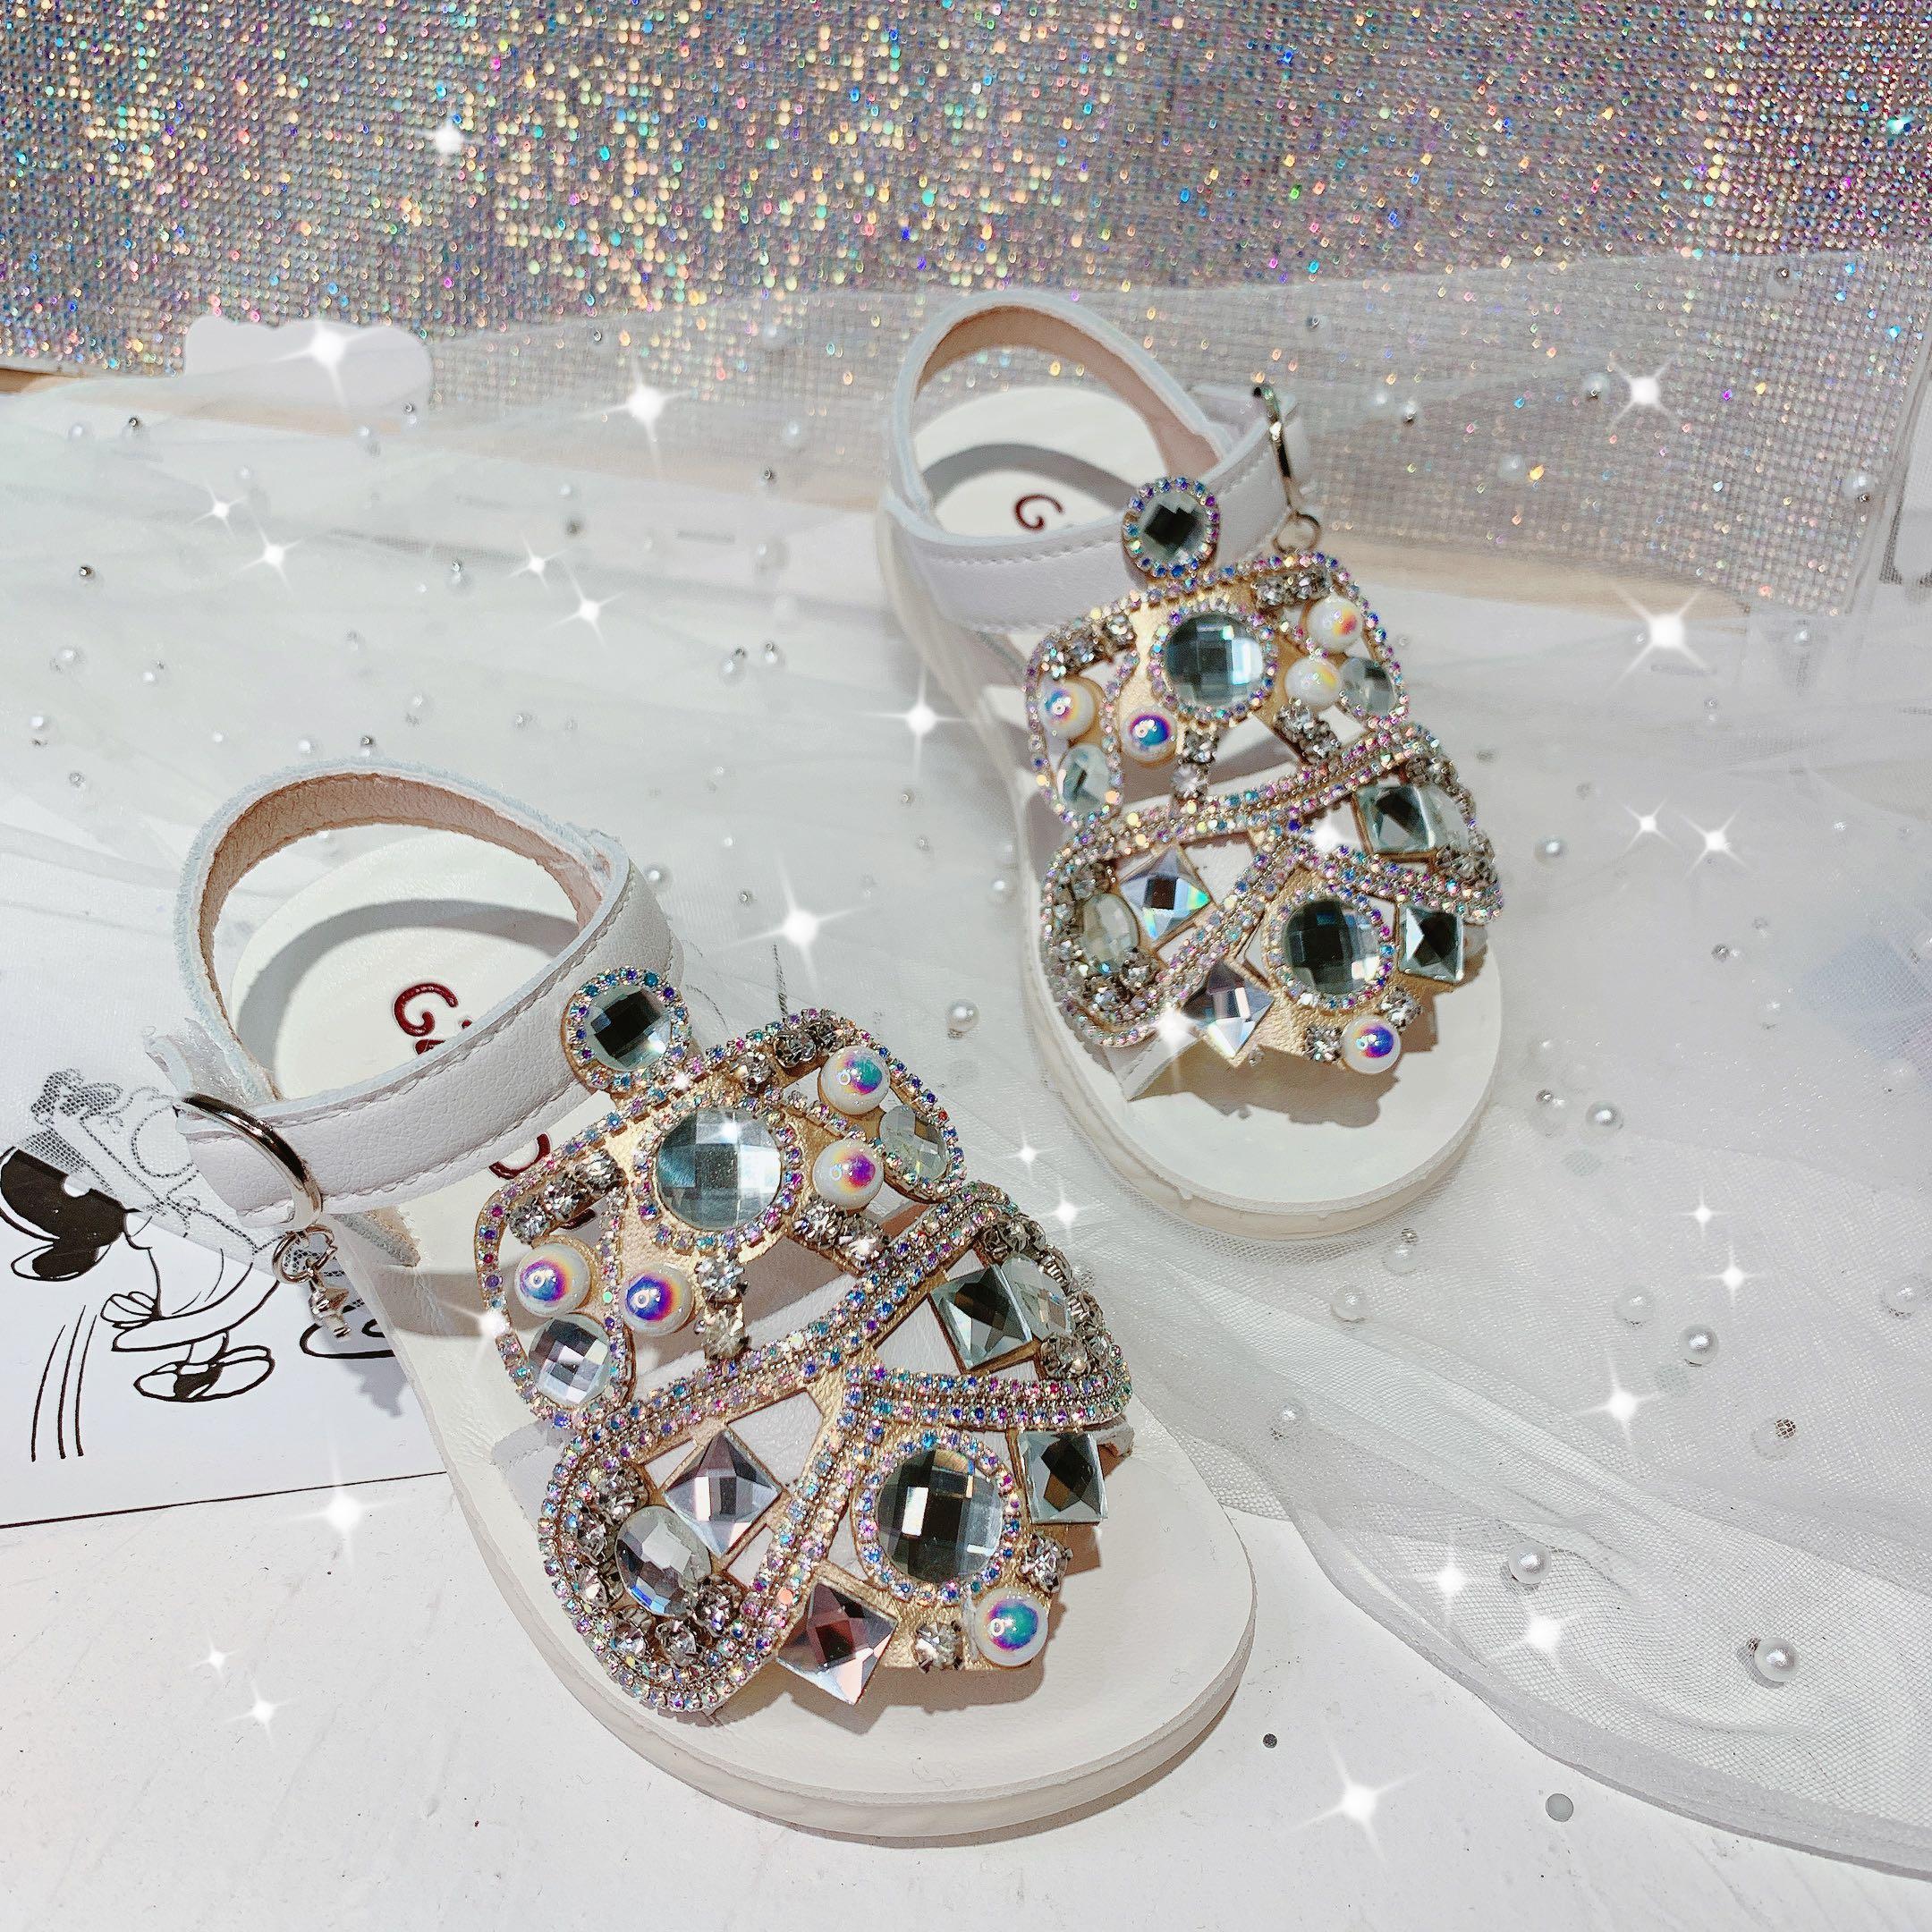 Koovan Children's Rhinestone Sandals 2020 Summer Girls Retro Crystal Luxury Roman Little Girl Retro Princess Shoes Sandals Cute